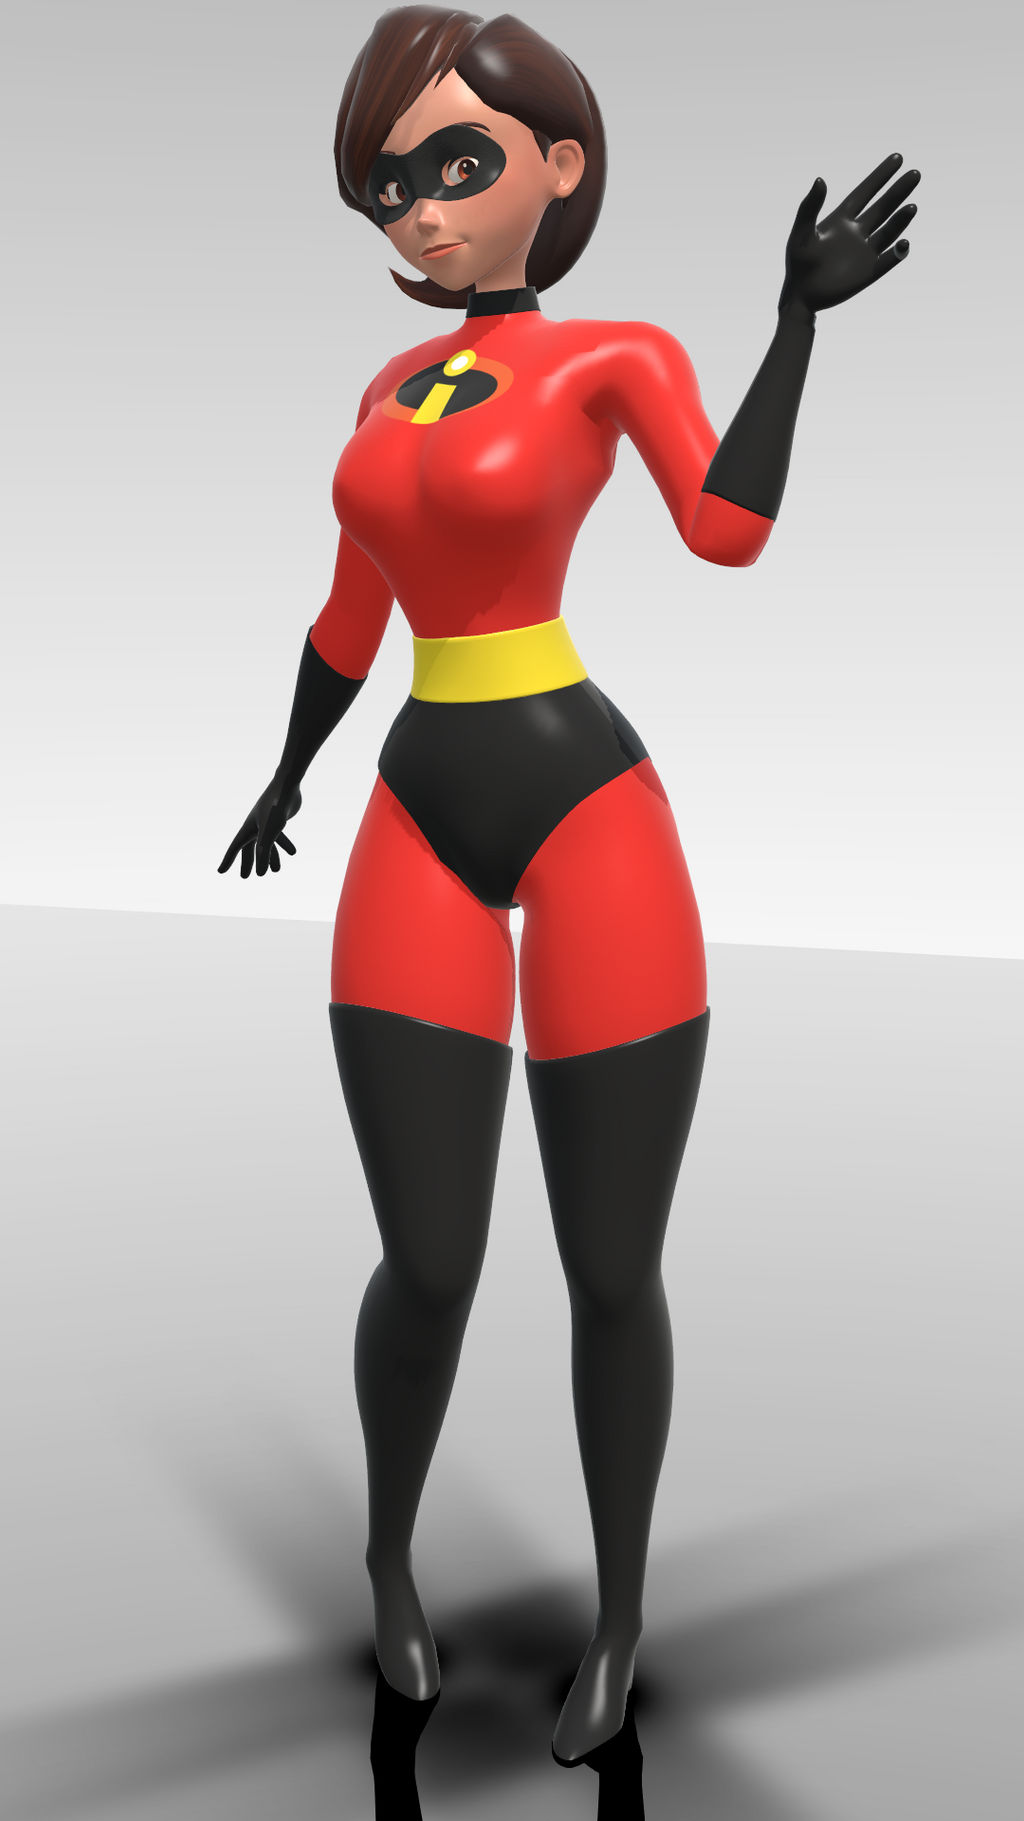 Helen parr big boobs deviantart Mmd Incredibles 2 Elastic Girl Model By Caribeandragon On Deviantart